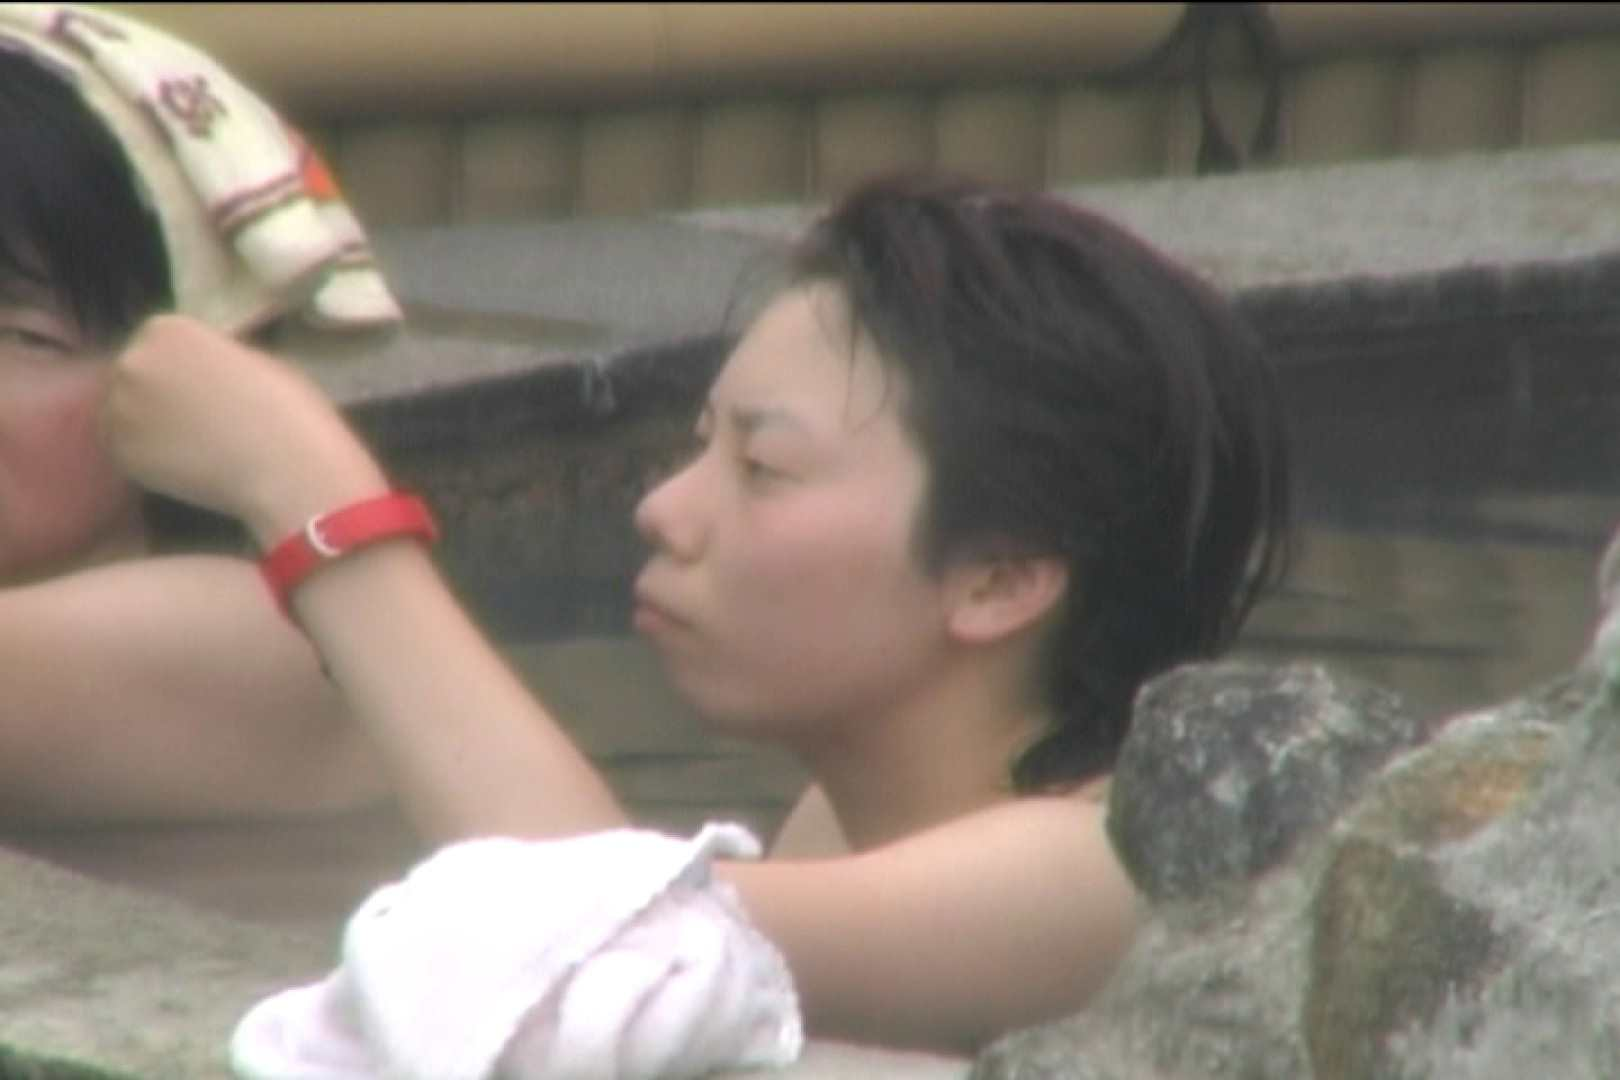 Aquaな露天風呂Vol.122 エッチな盗撮 オメコ無修正動画無料 107pic 90